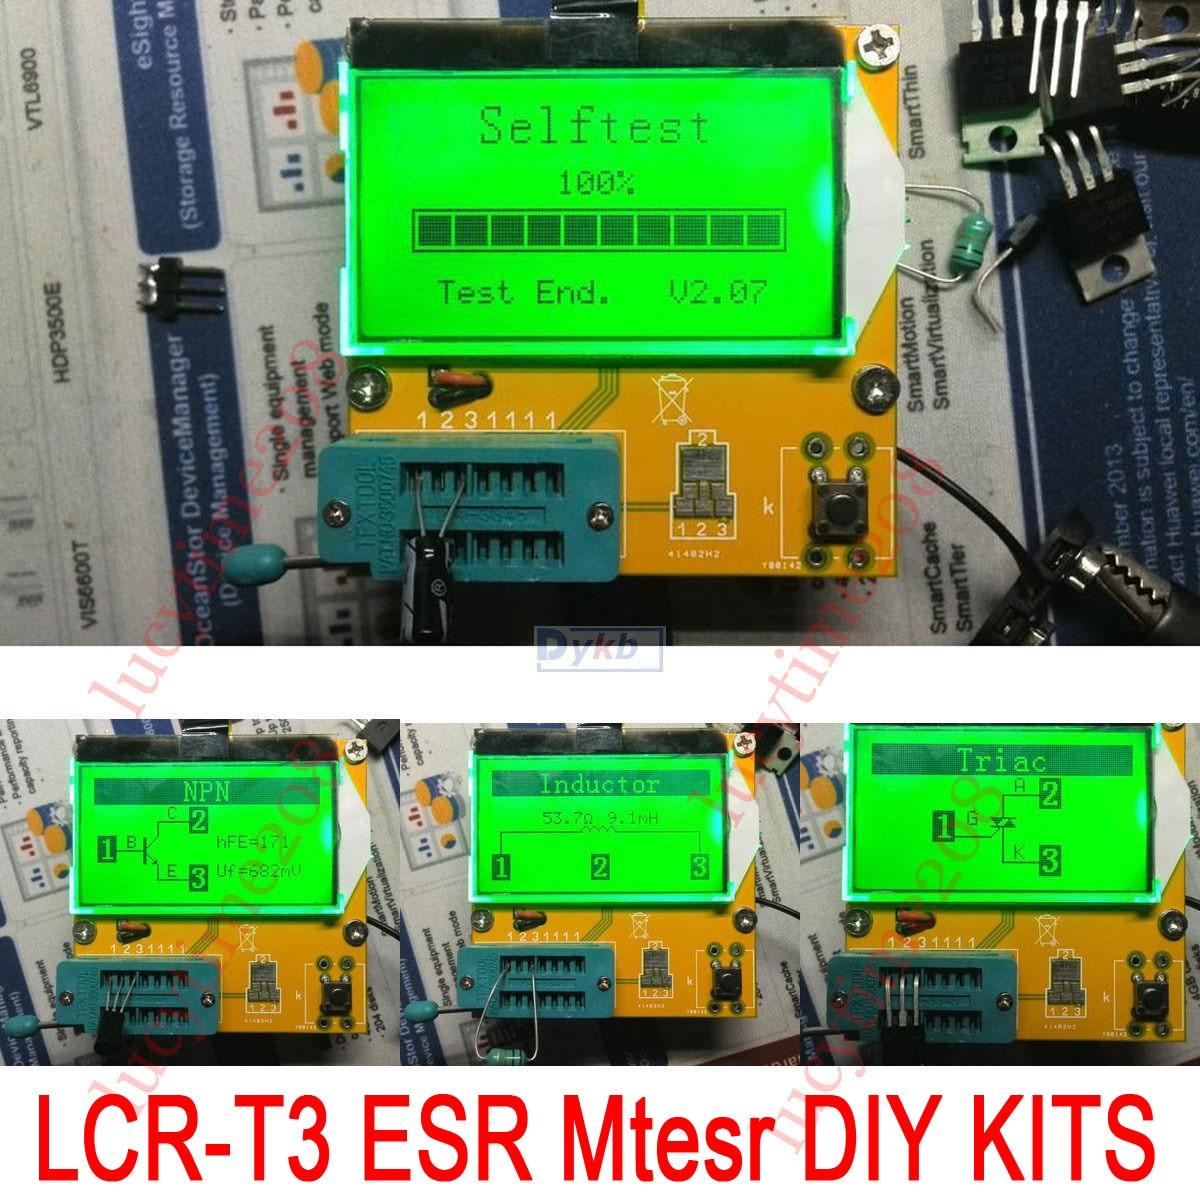 Div Classgrid Classimgholder Img Srchttps Tester Graphic Display Rlc Esr Meterin Integrated Circuits Diy Lcr T3 Mega328